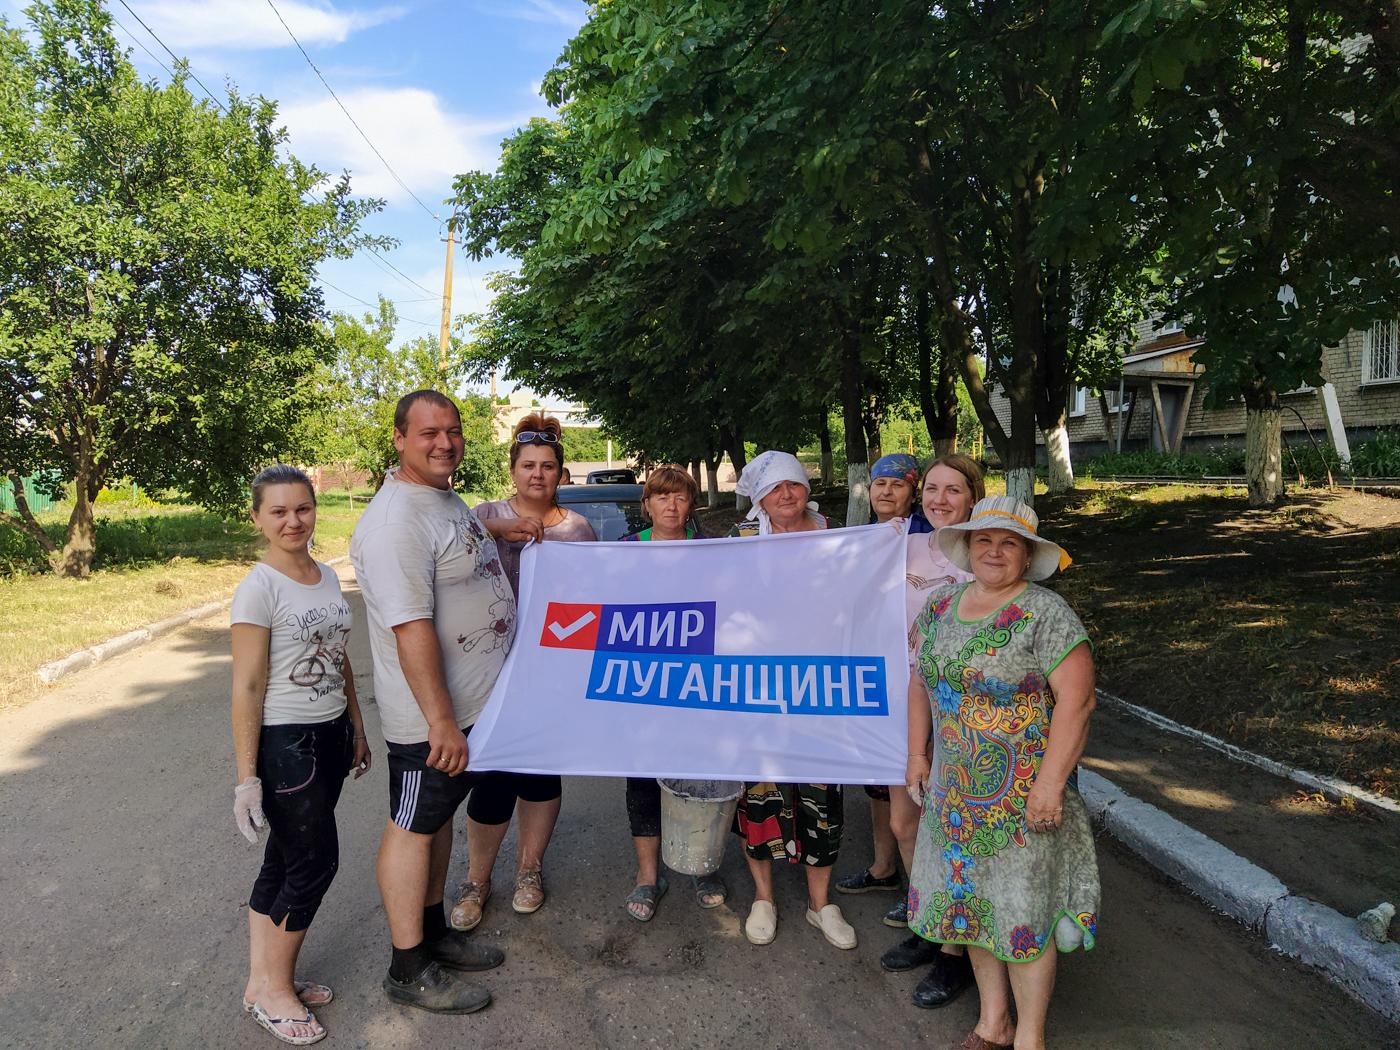 Активисты ОД «Мир Луганщине» провели субботник в посёлке Металлист